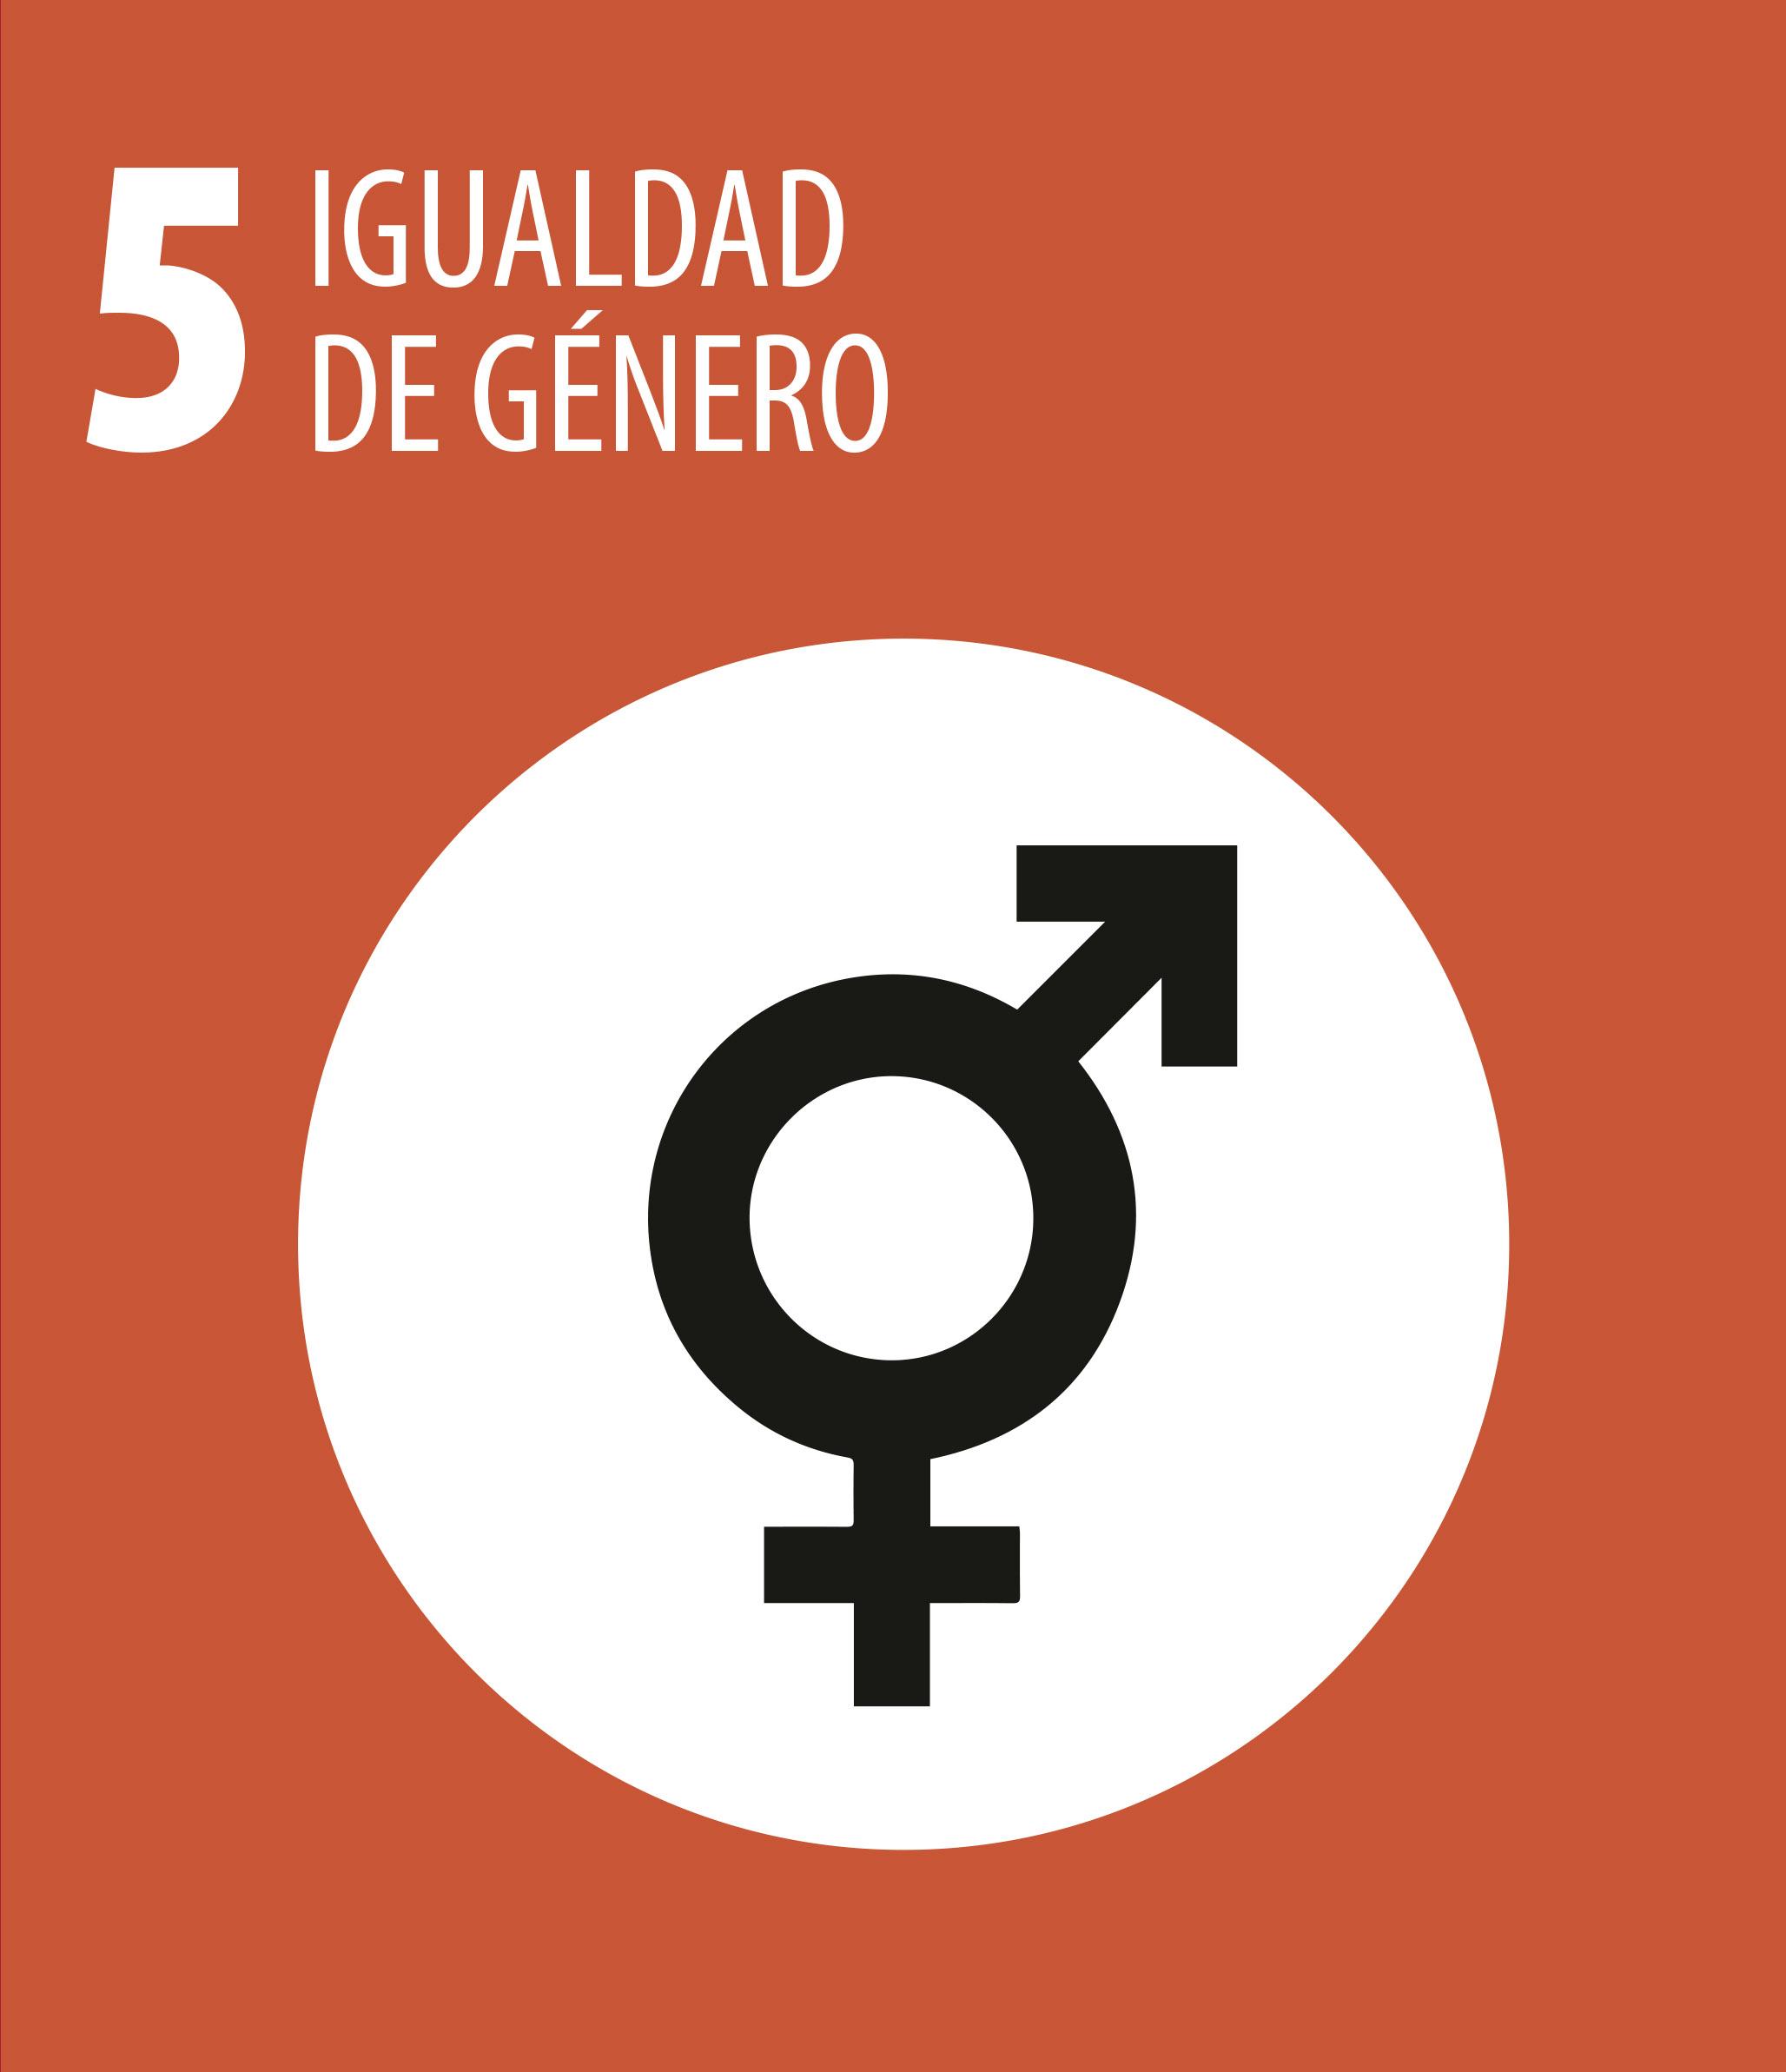 ODS 5 Igualdad genero